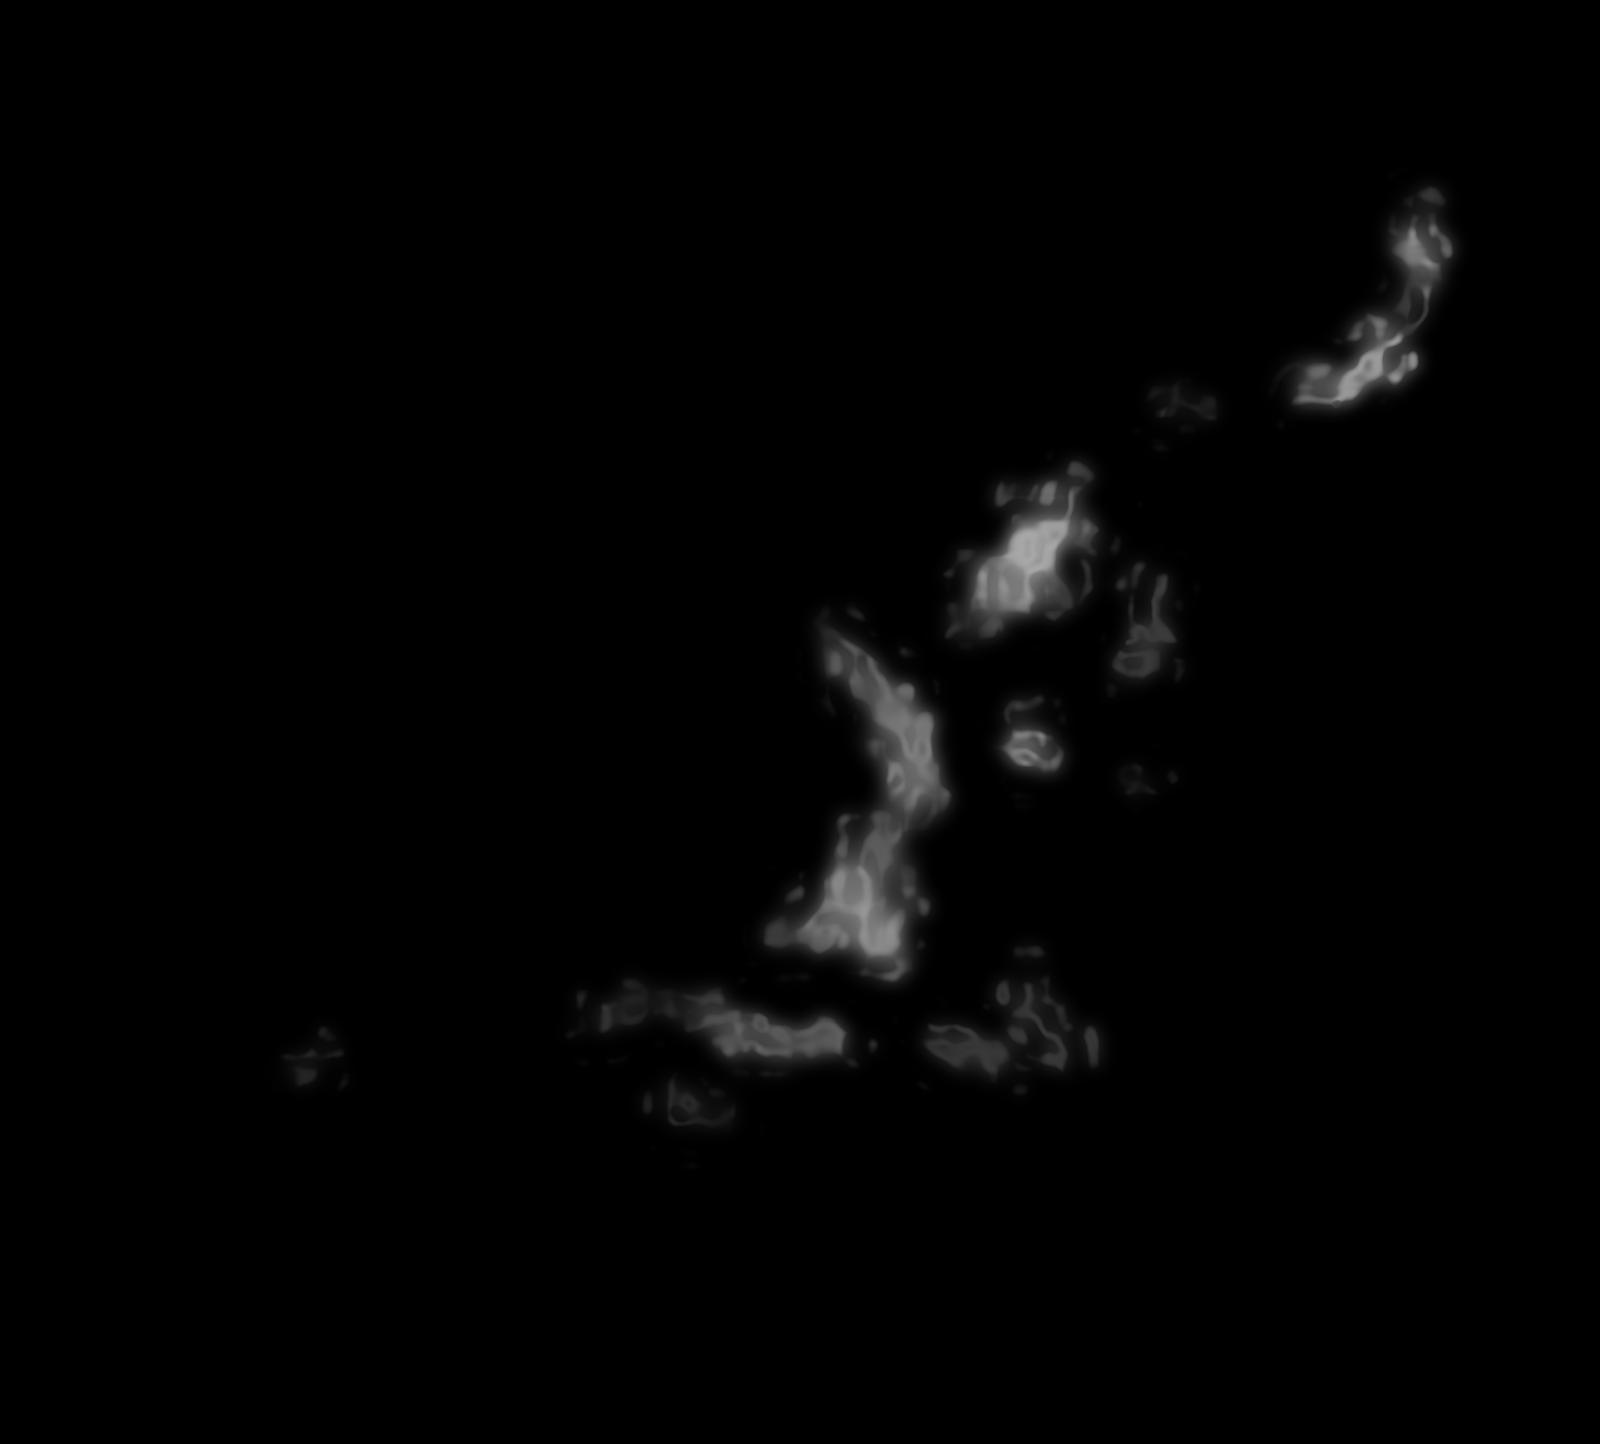 height field, height map, Thorfinn Tait, Adobe Photoshop, layer mask